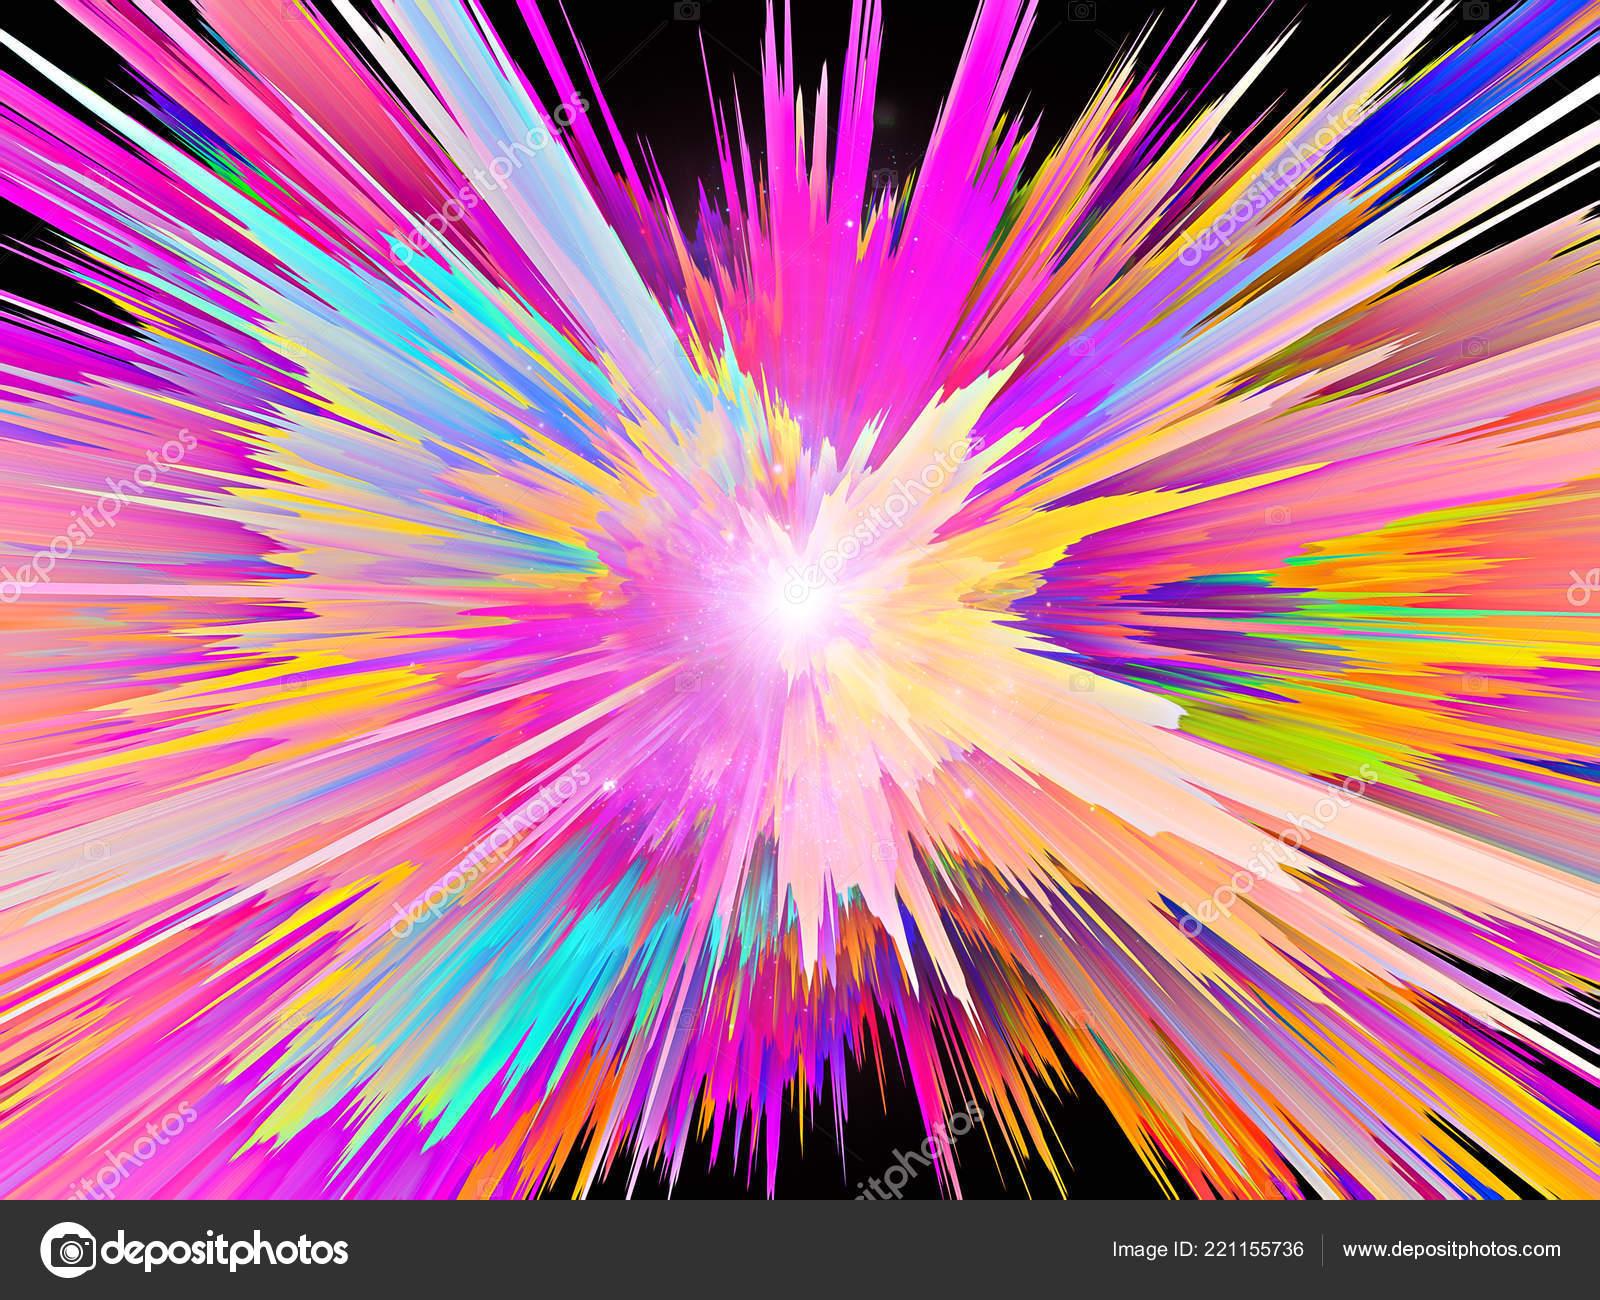 cb29ff6ddf3 Έκρηξη Των Κορεσμένων Εικονικό Χρώμα Υφή Για Δυναμικές Εικόνες Φόντου–  εικόνα αρχείου